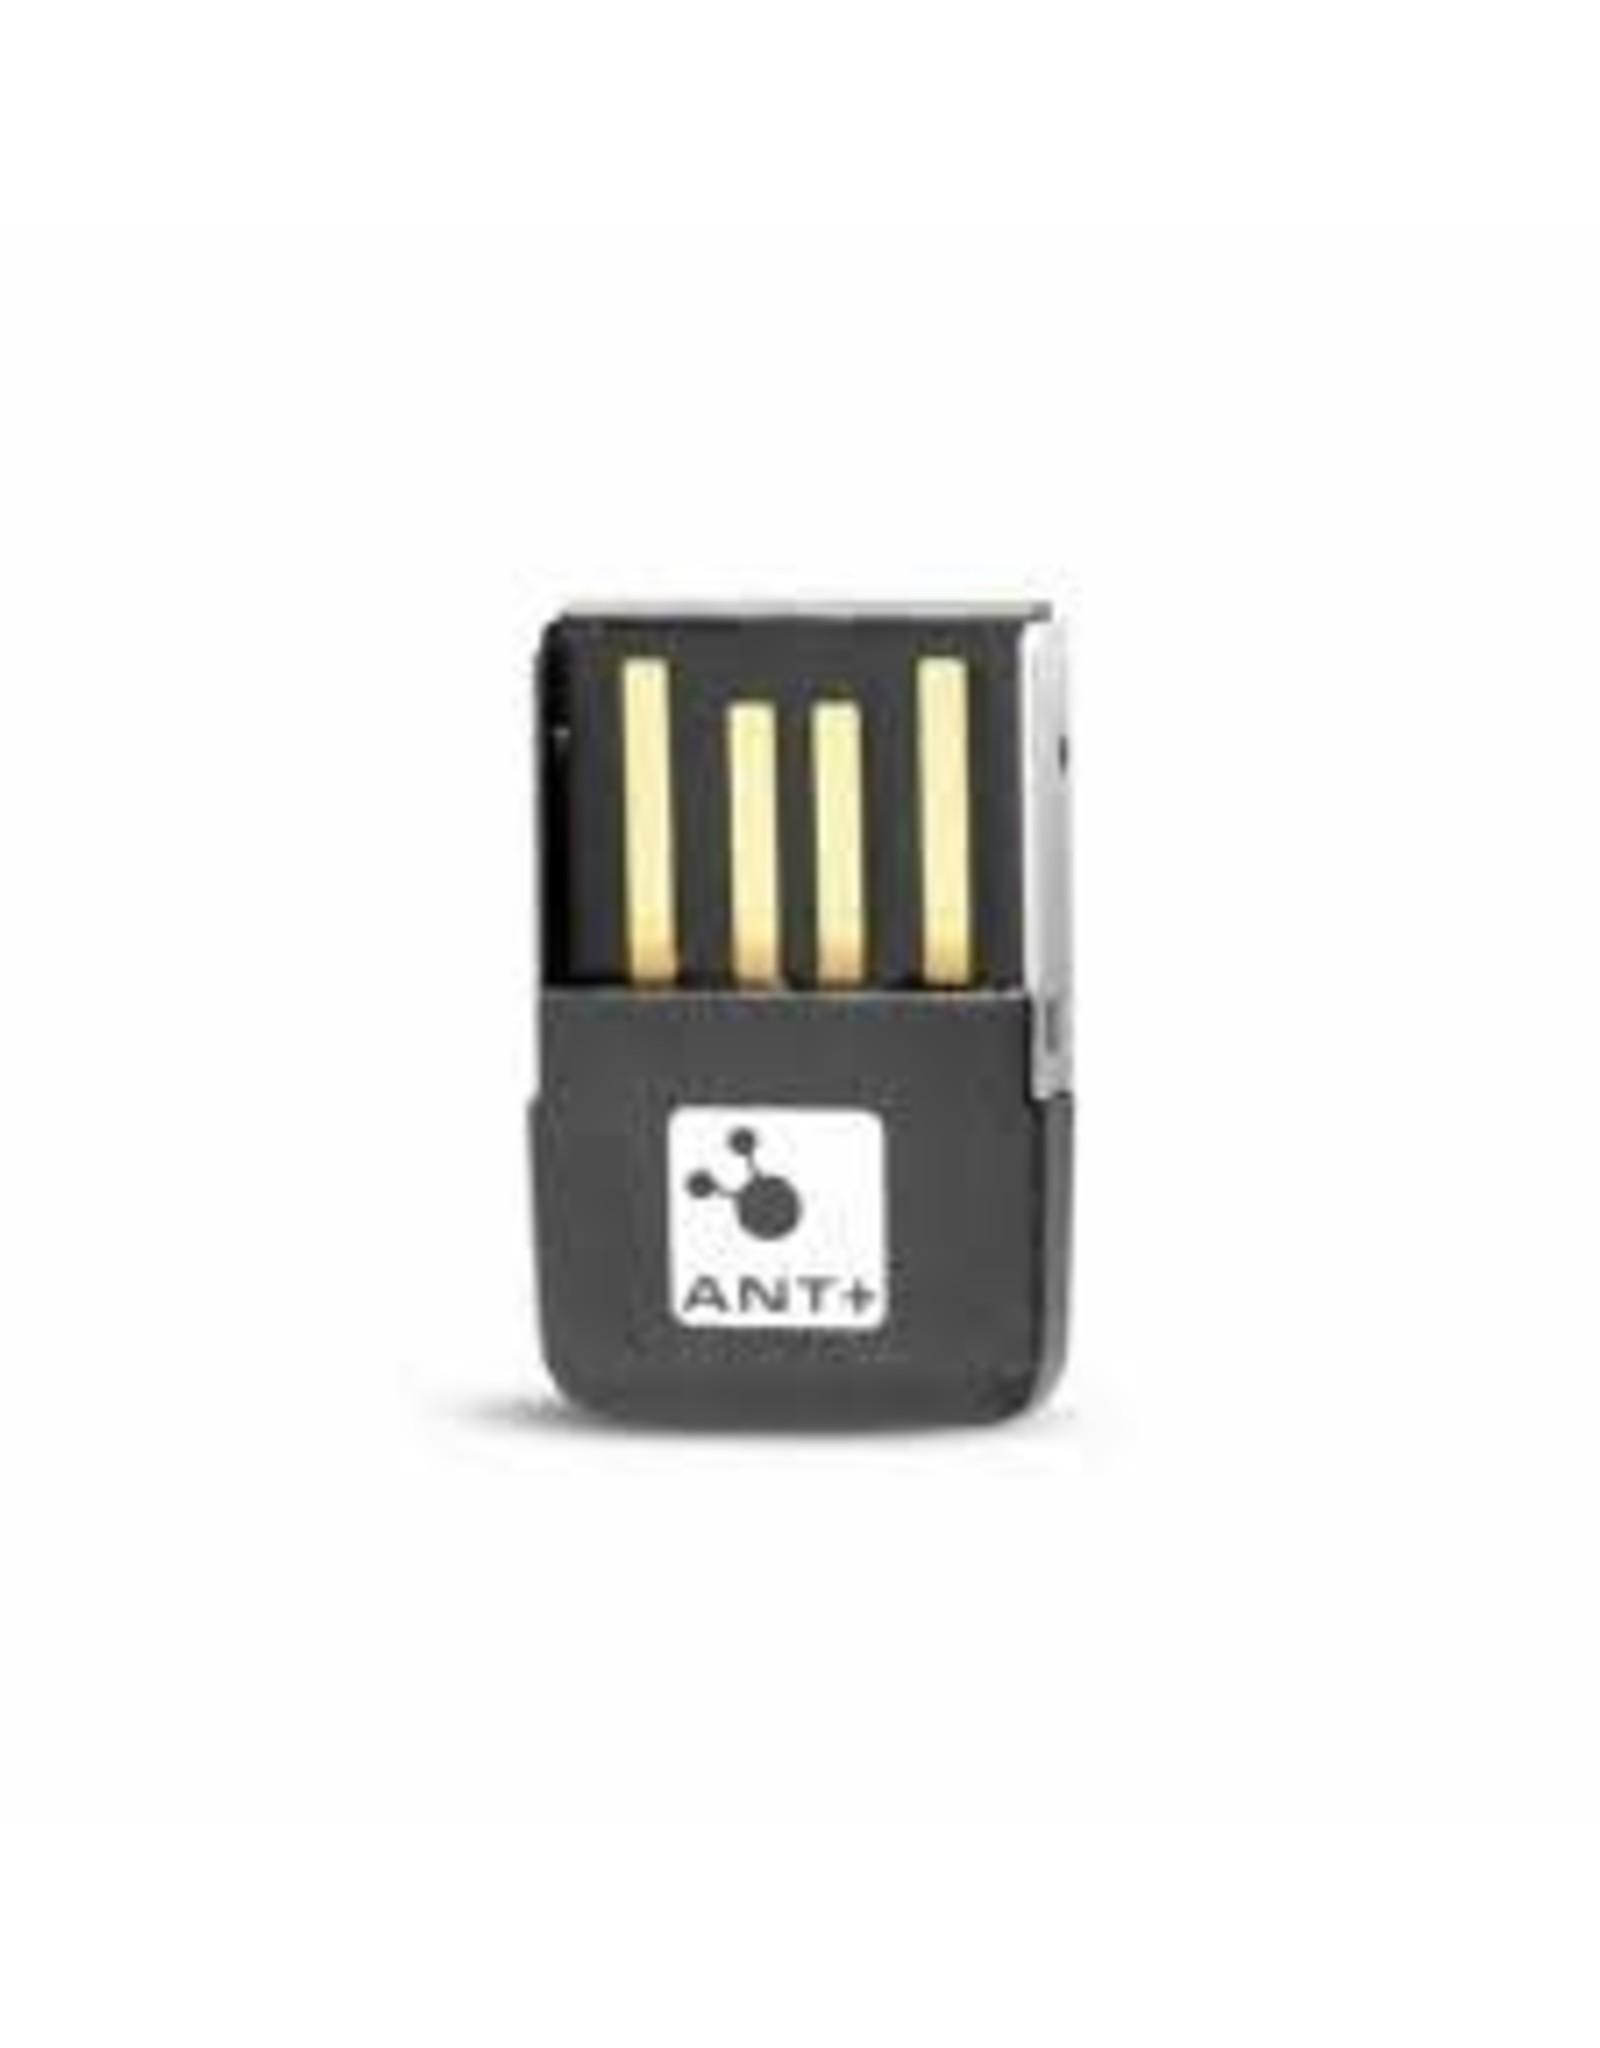 Garmin ANT Dongle Garmin USB Computer Stick, Black